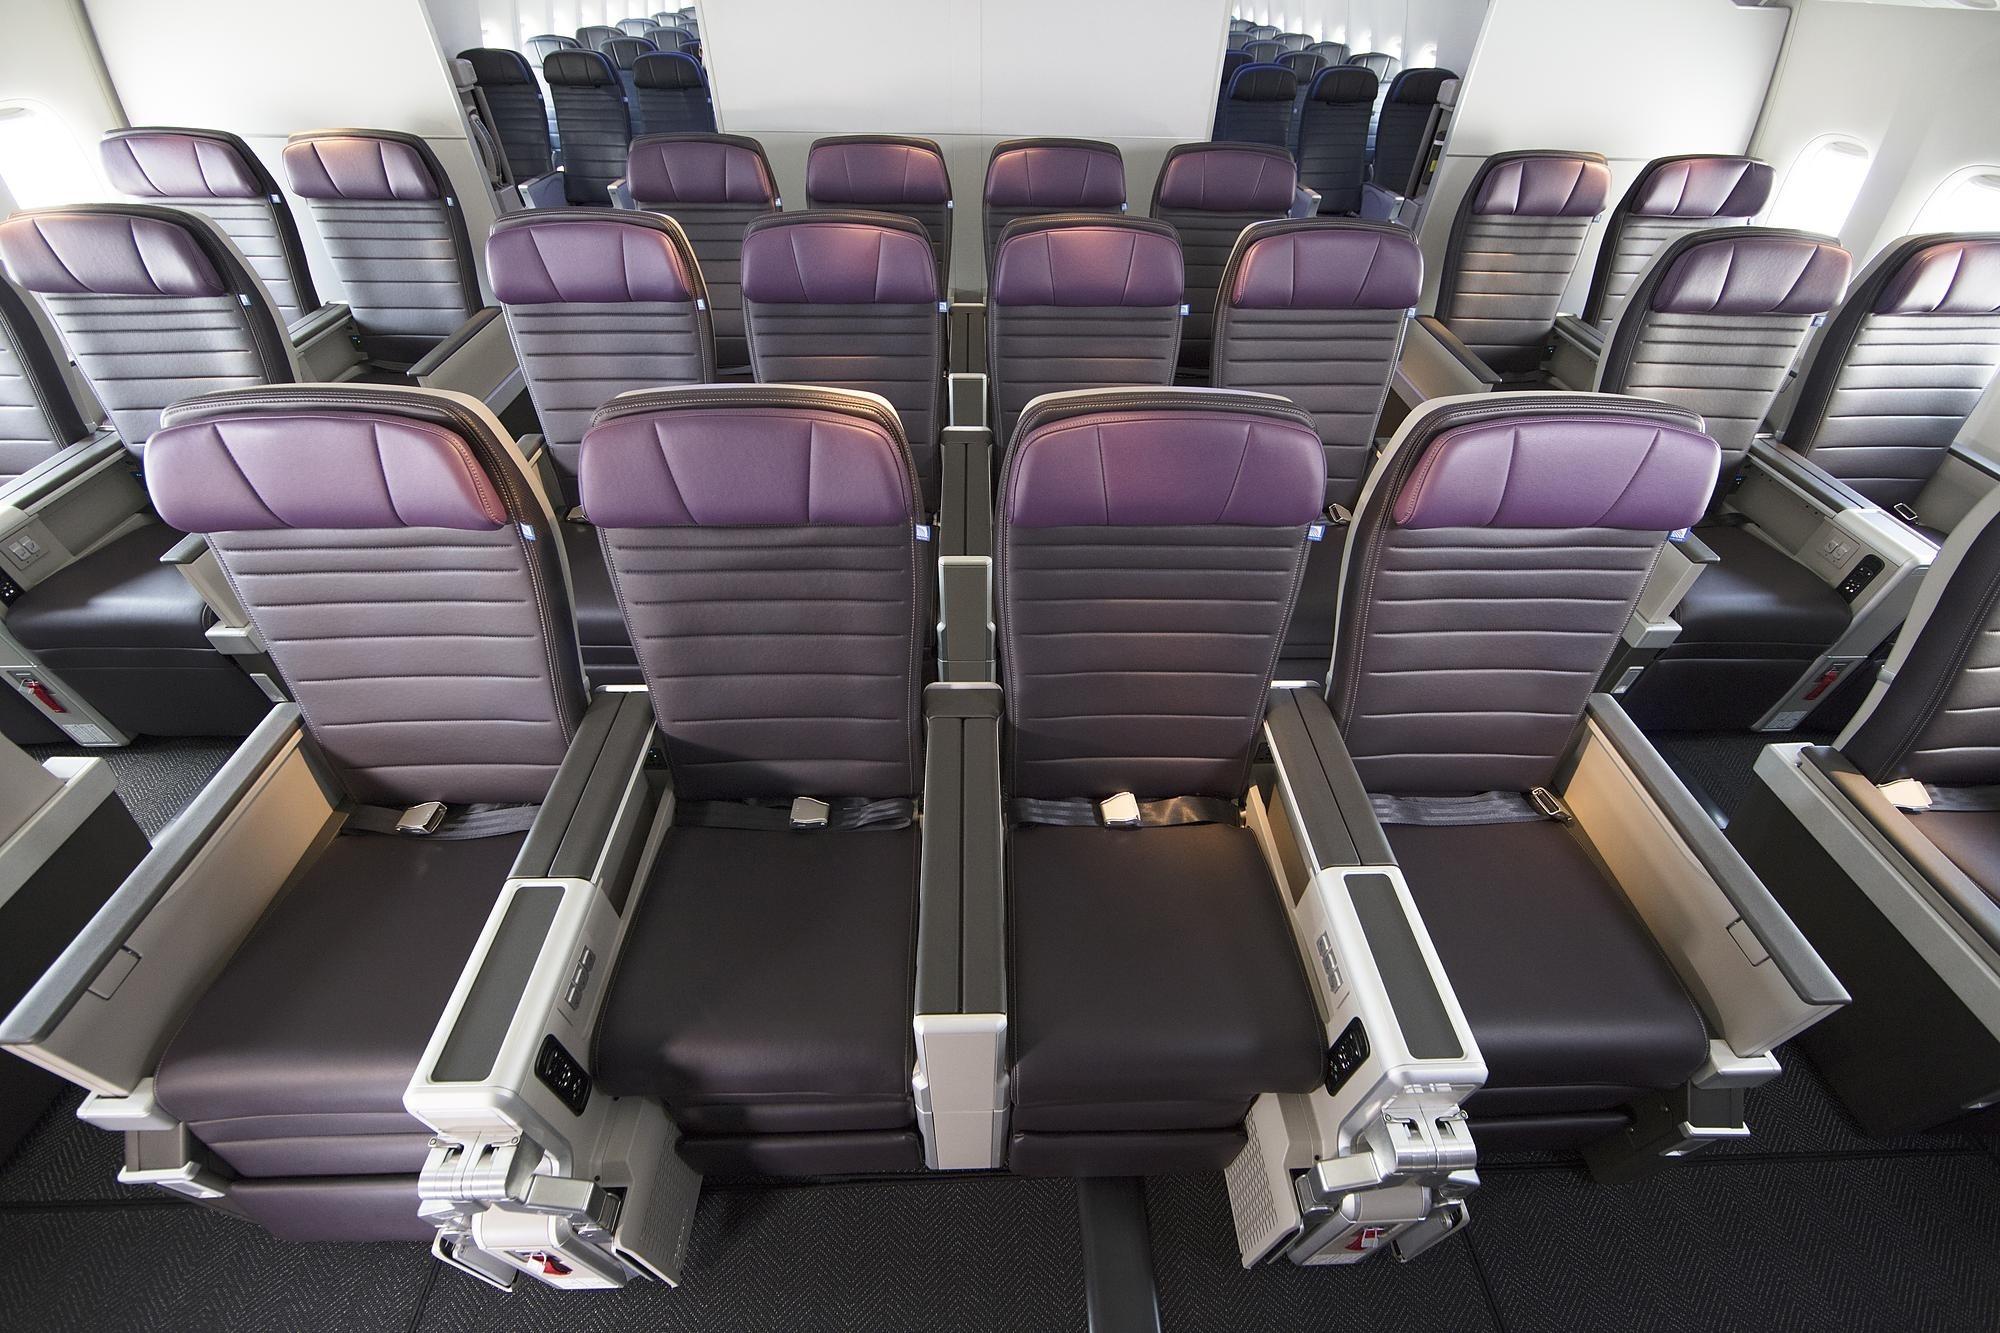 United Airlines International Premium Economy Seats Go on ...